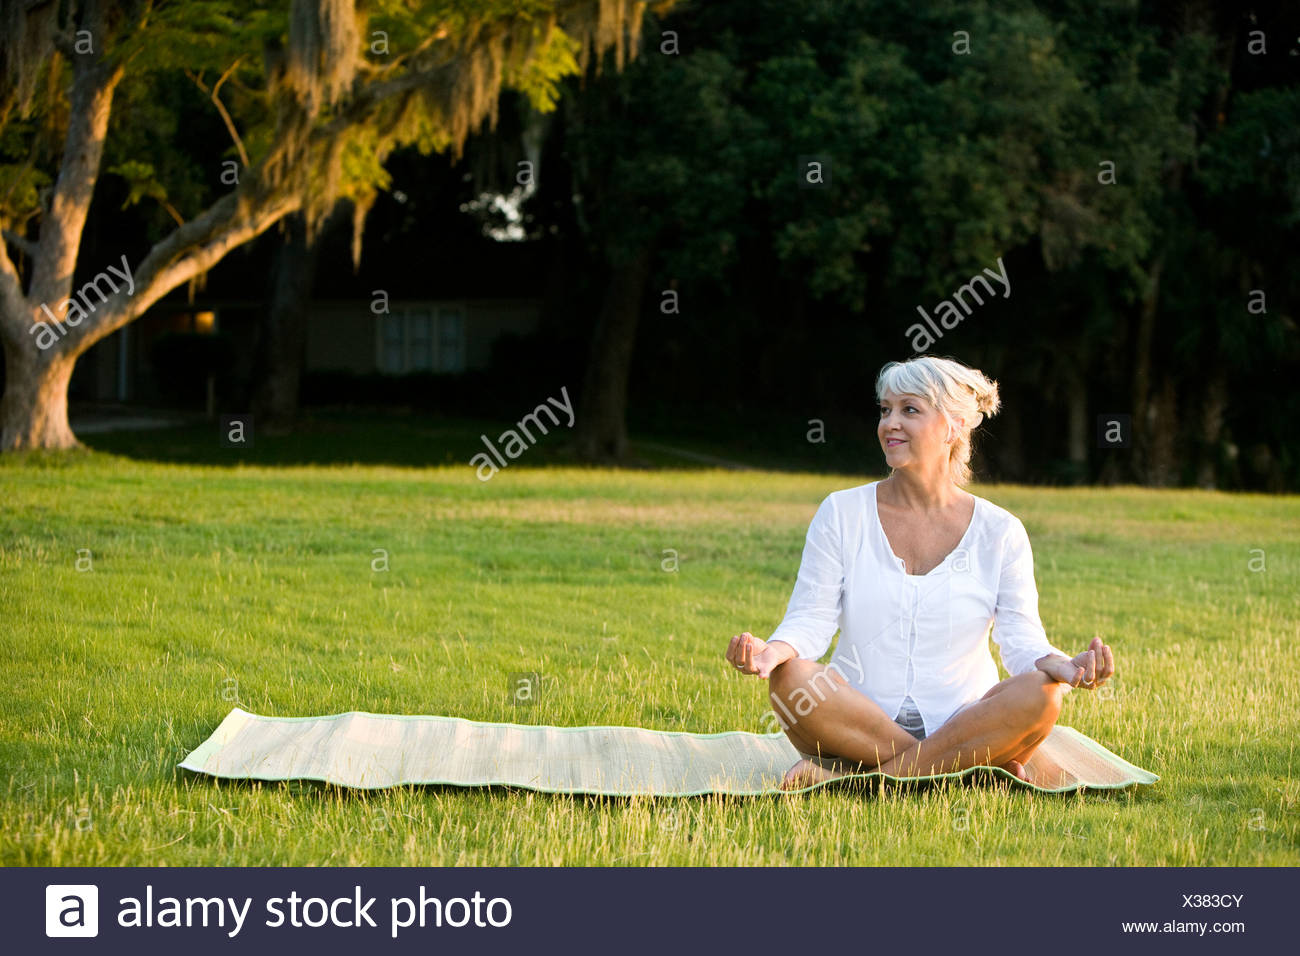 Mature Woman Yoga Alone Stock Photos & Mature Woman Yoga Alone Stock ...